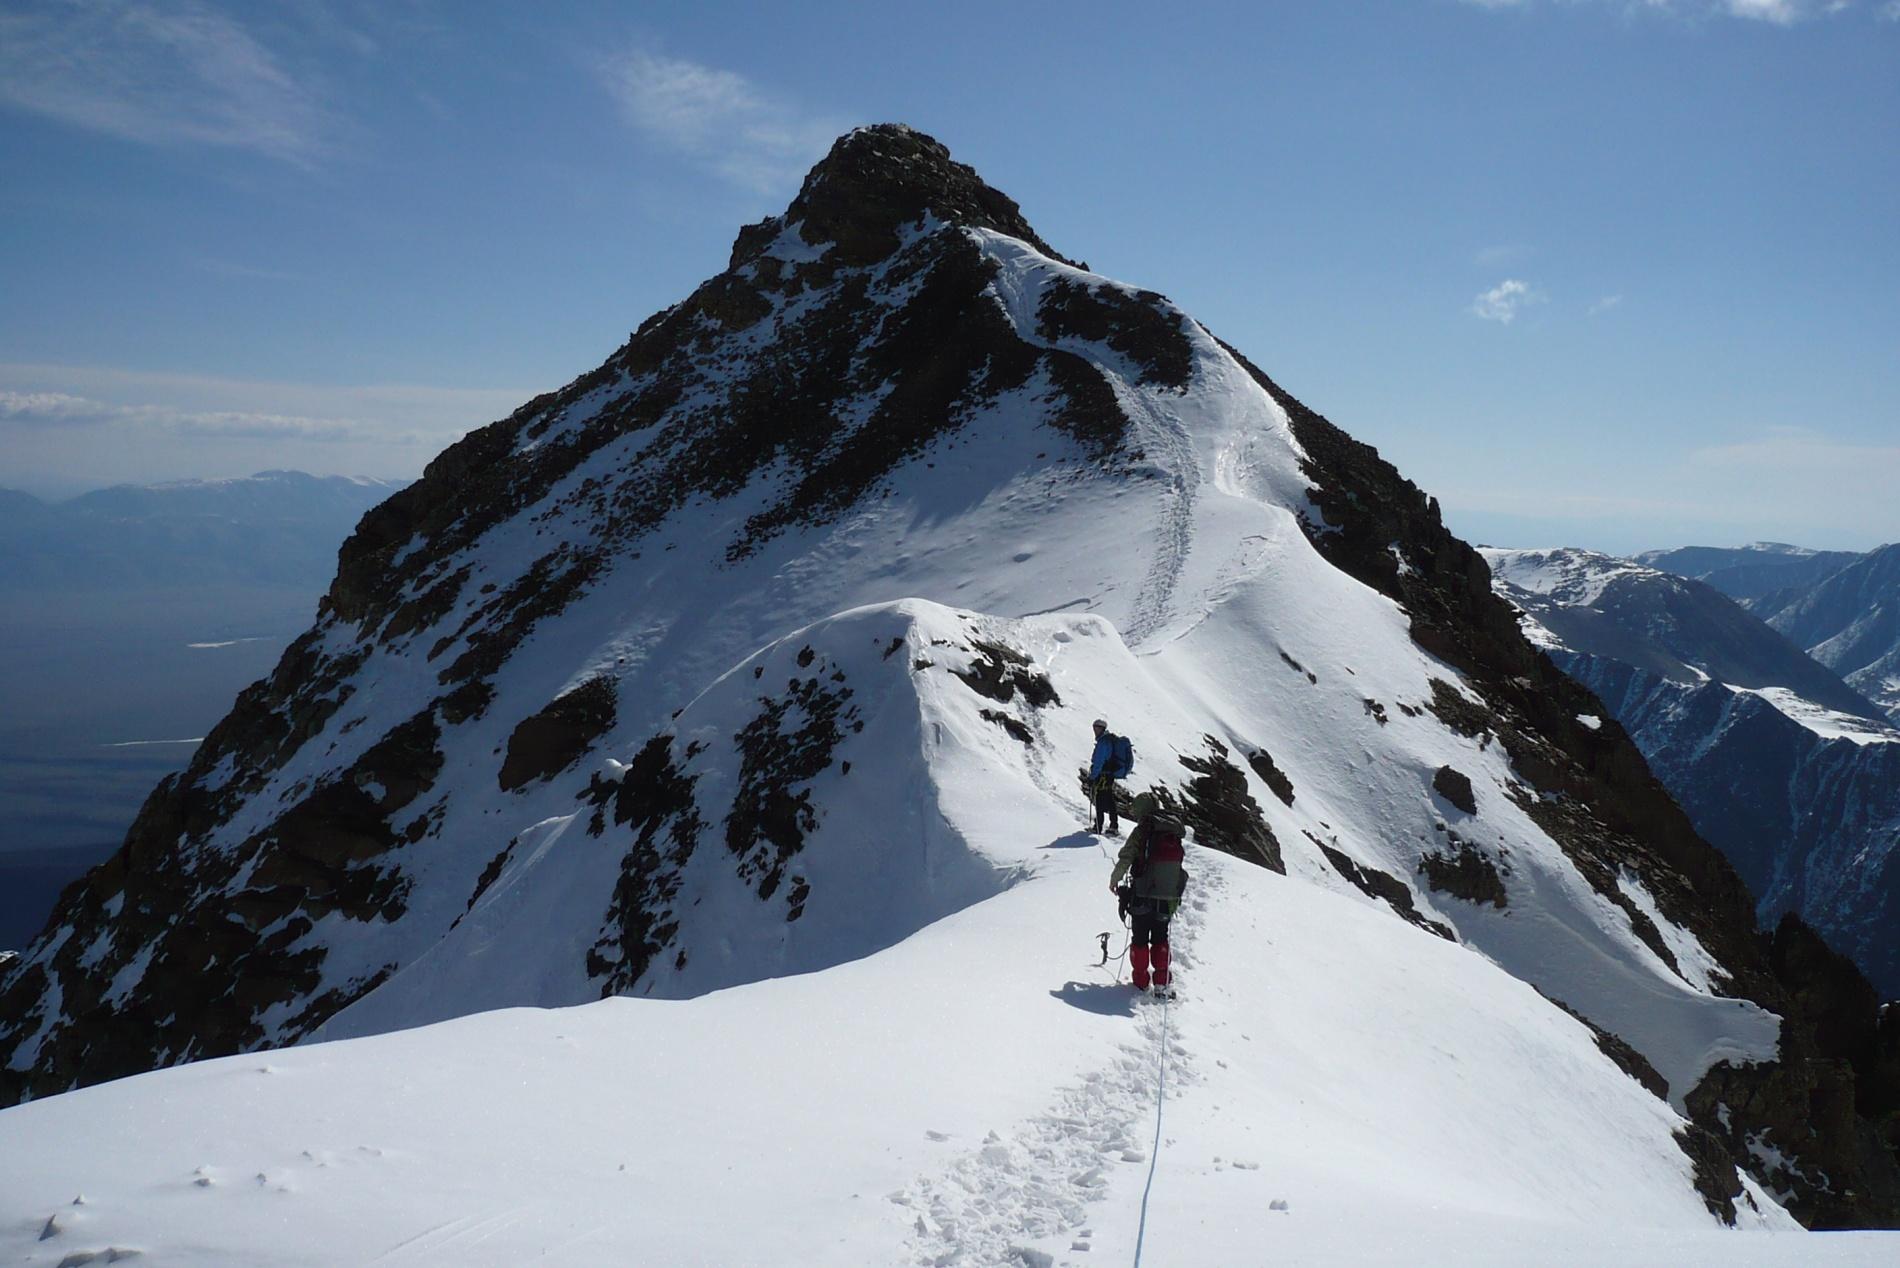 На подходе к вершине Кзылташ (3 486 м н.у.м.)